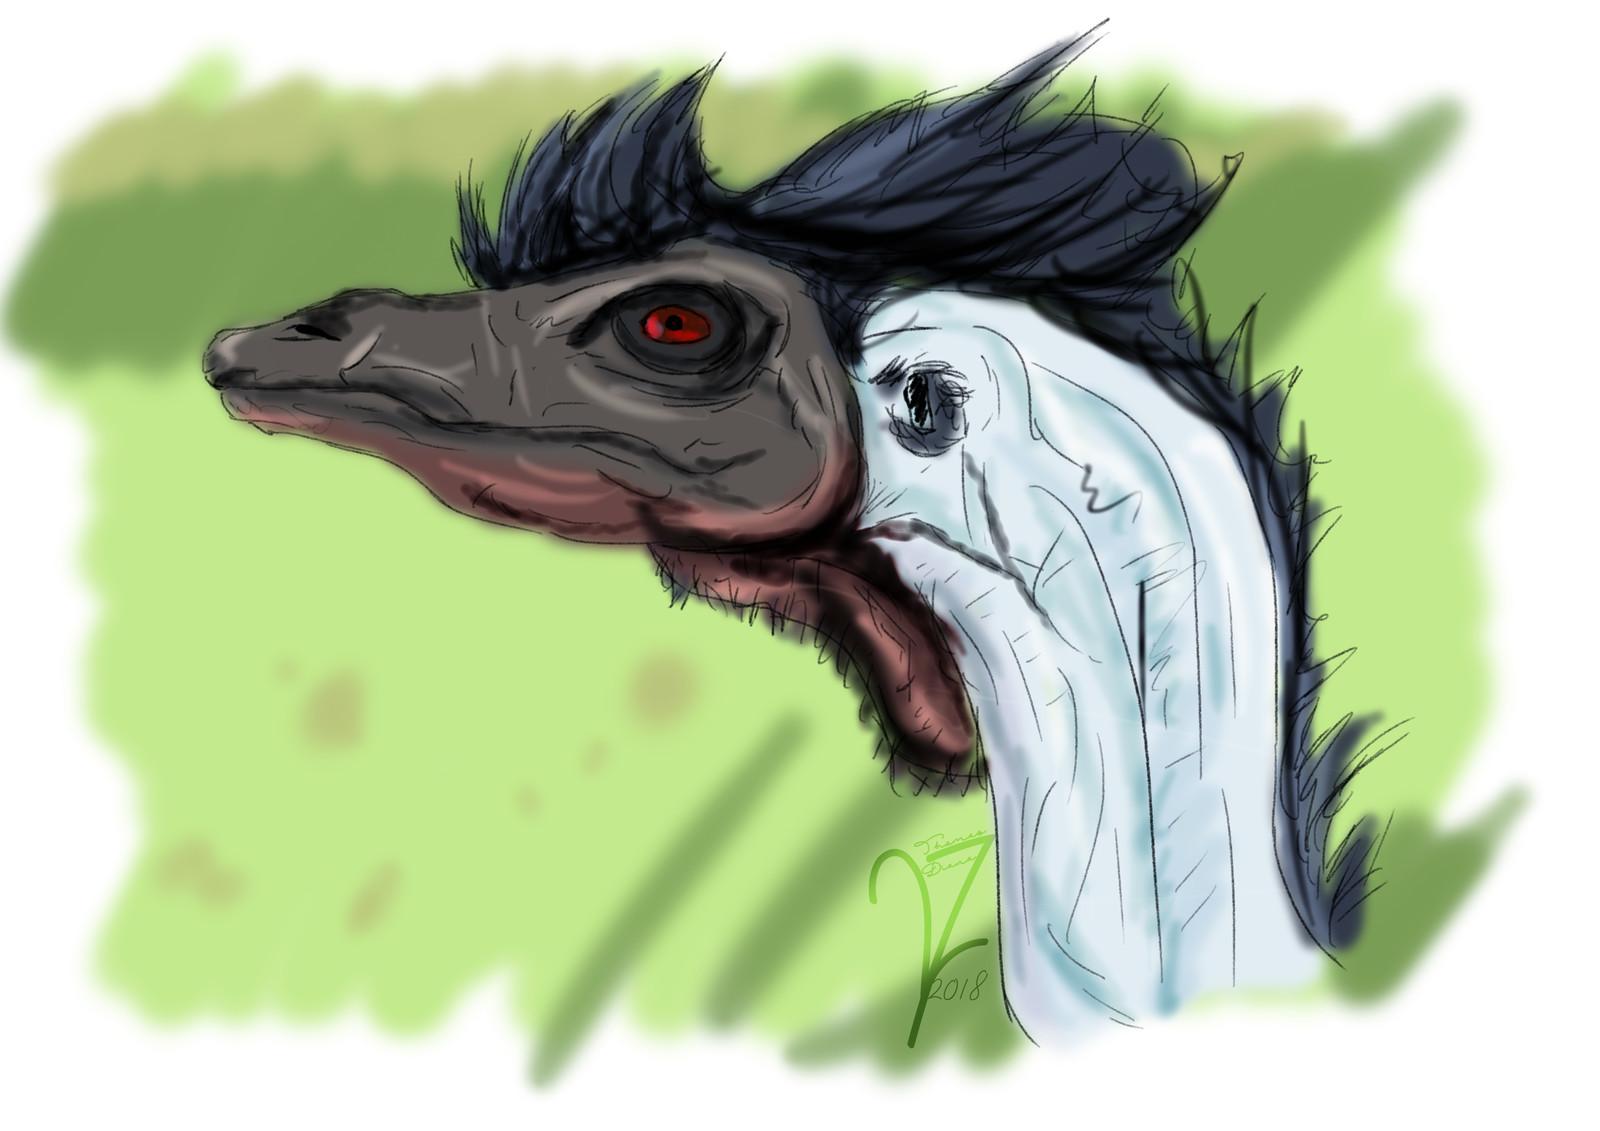 Emeusaurus